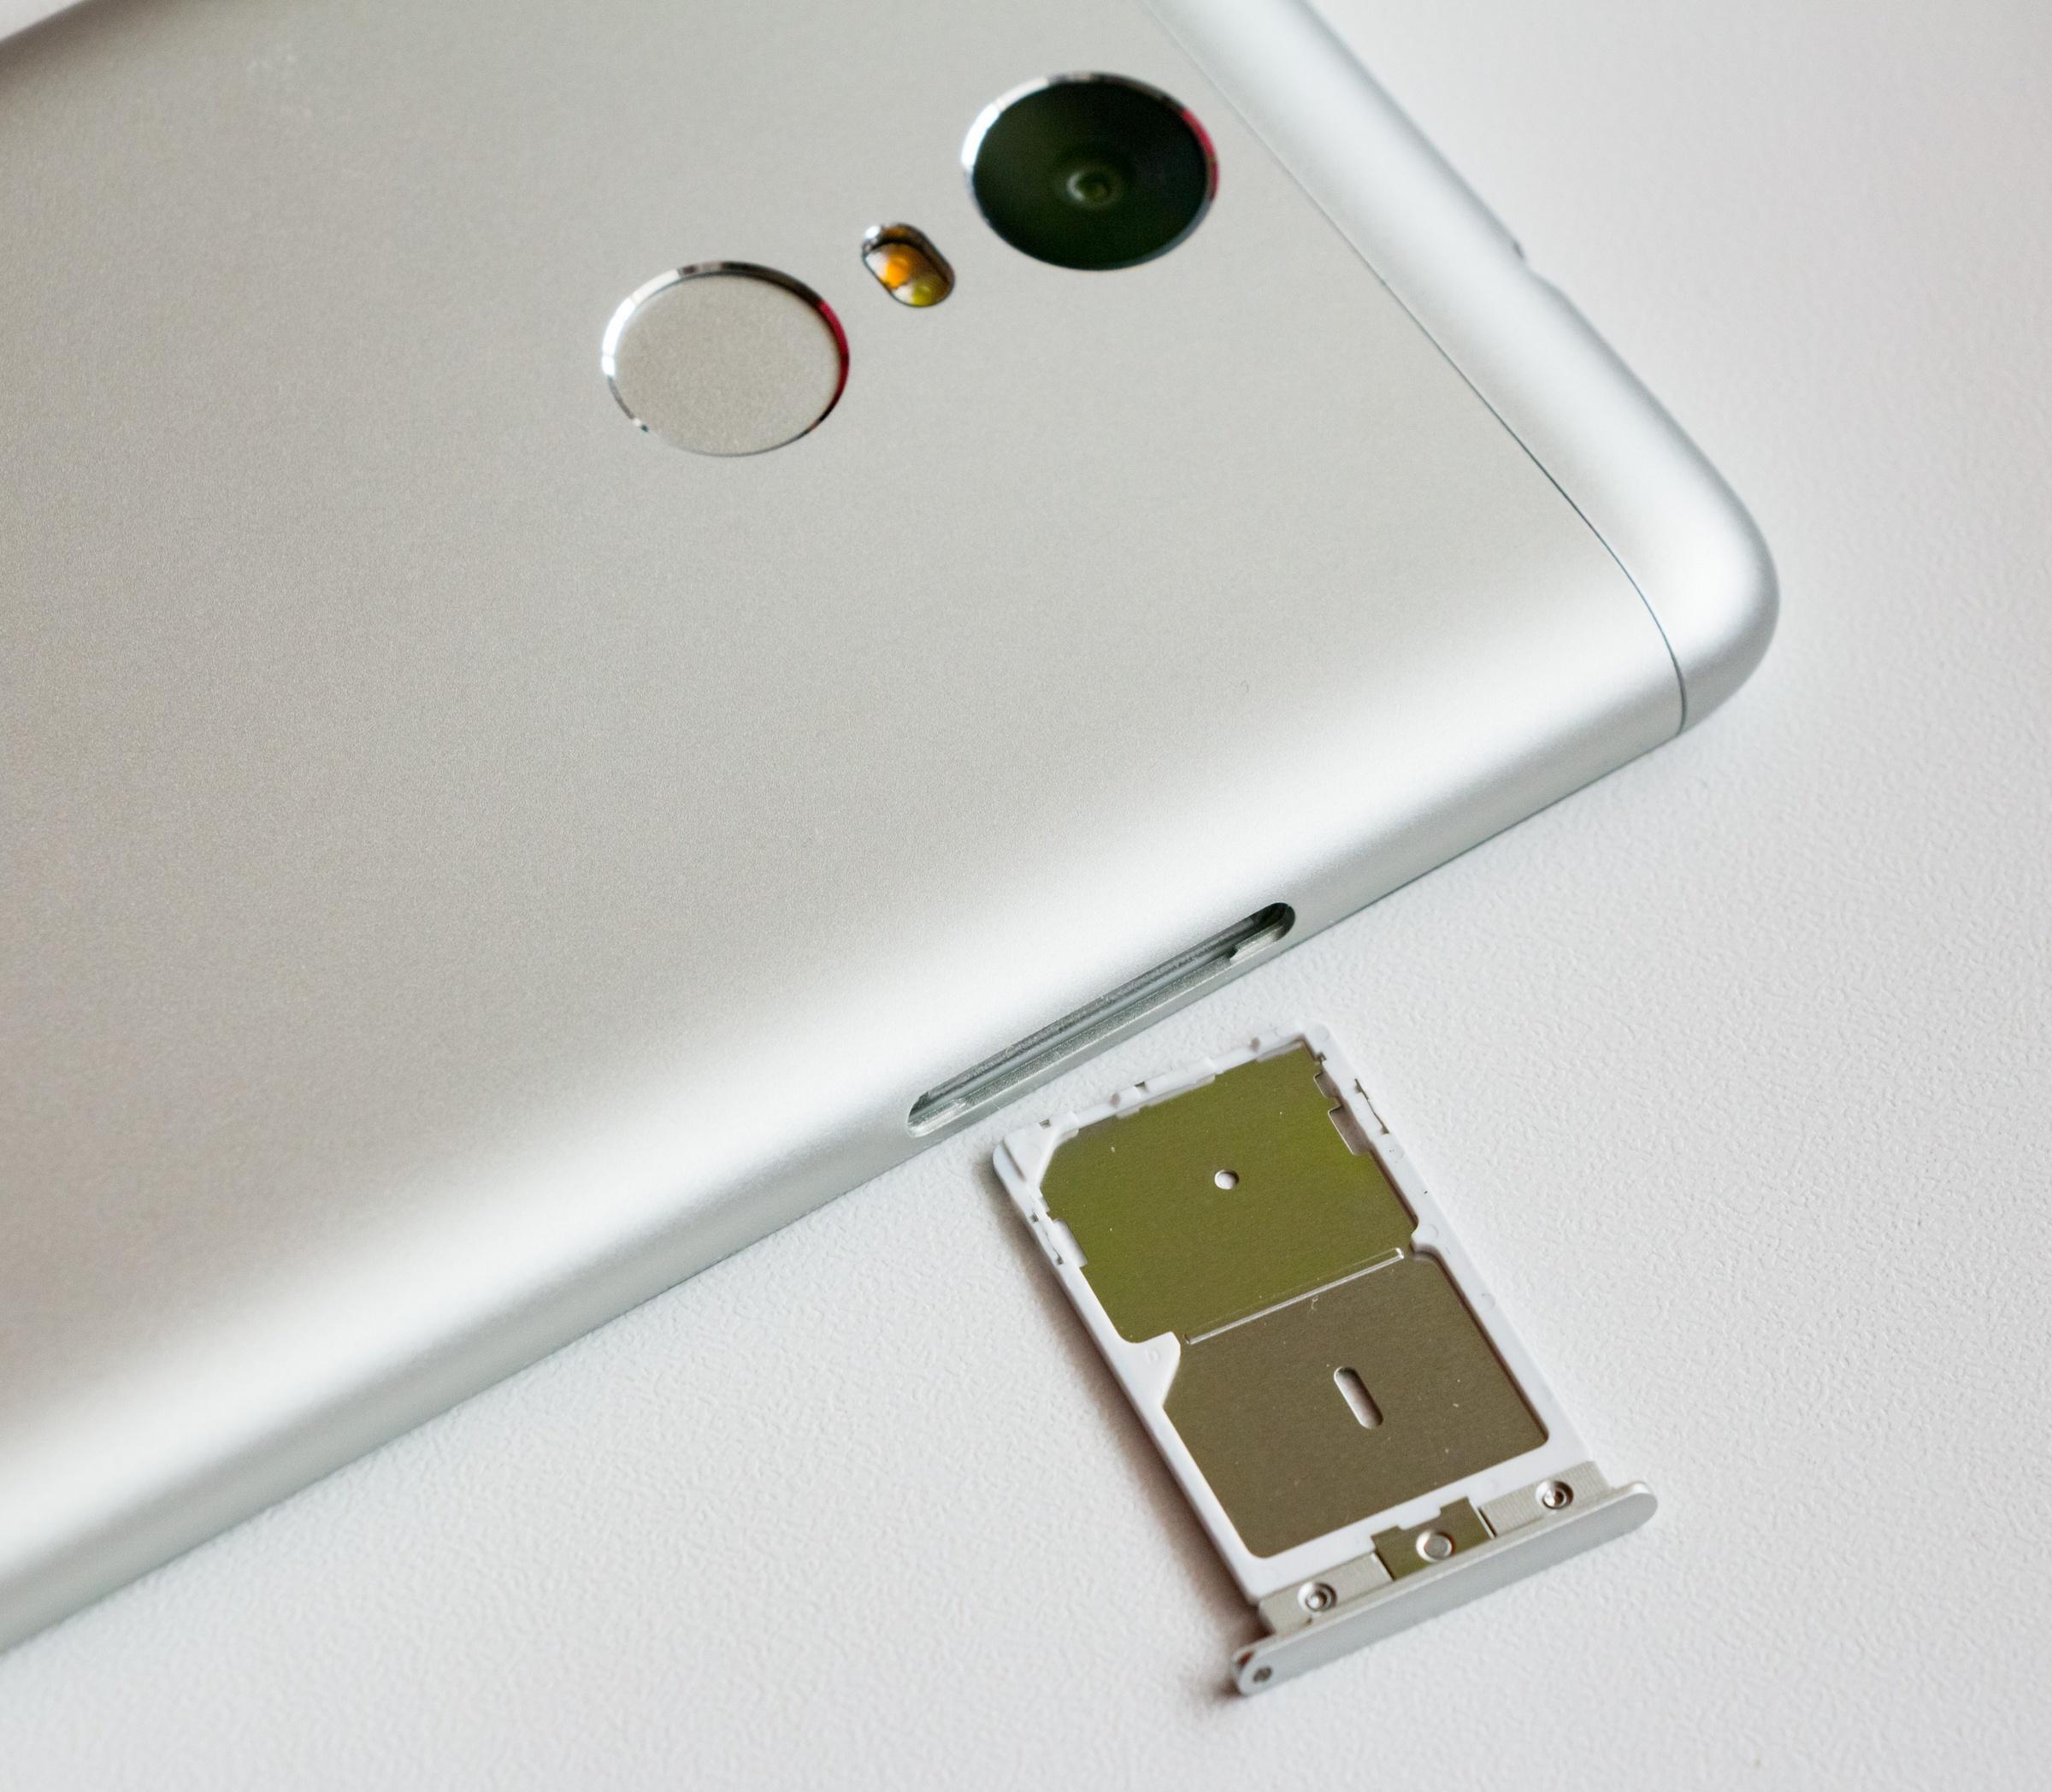 Xiaomi_Redmi_Note_3_dual_SIM_card_tray (1)